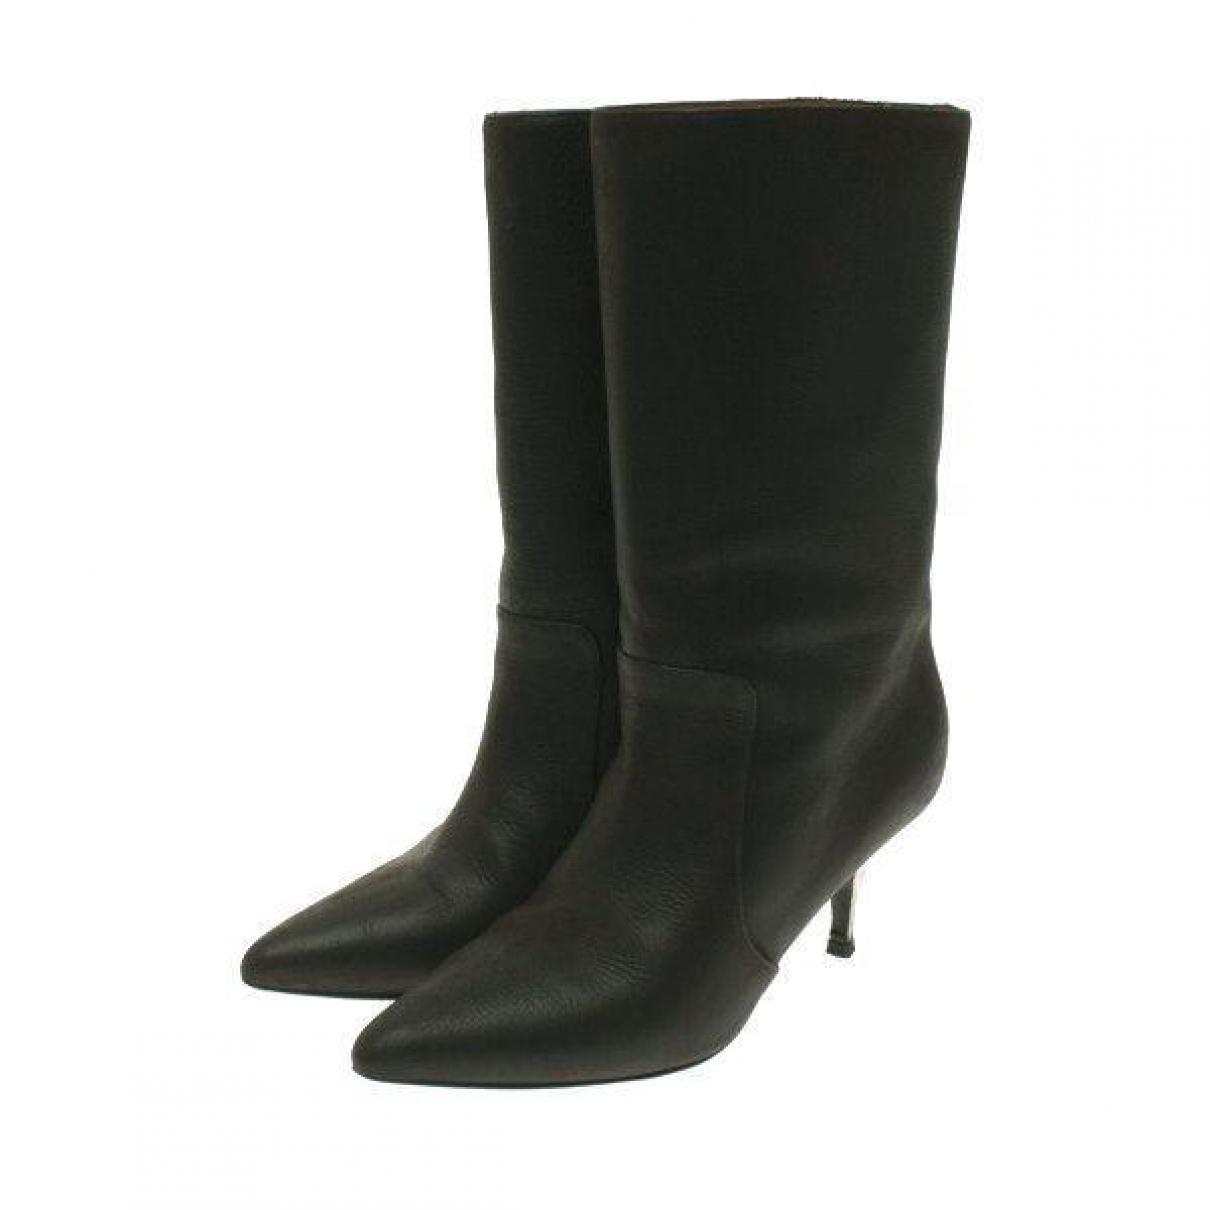 Lanvin \N Black Leather Boots for Women 37 EU